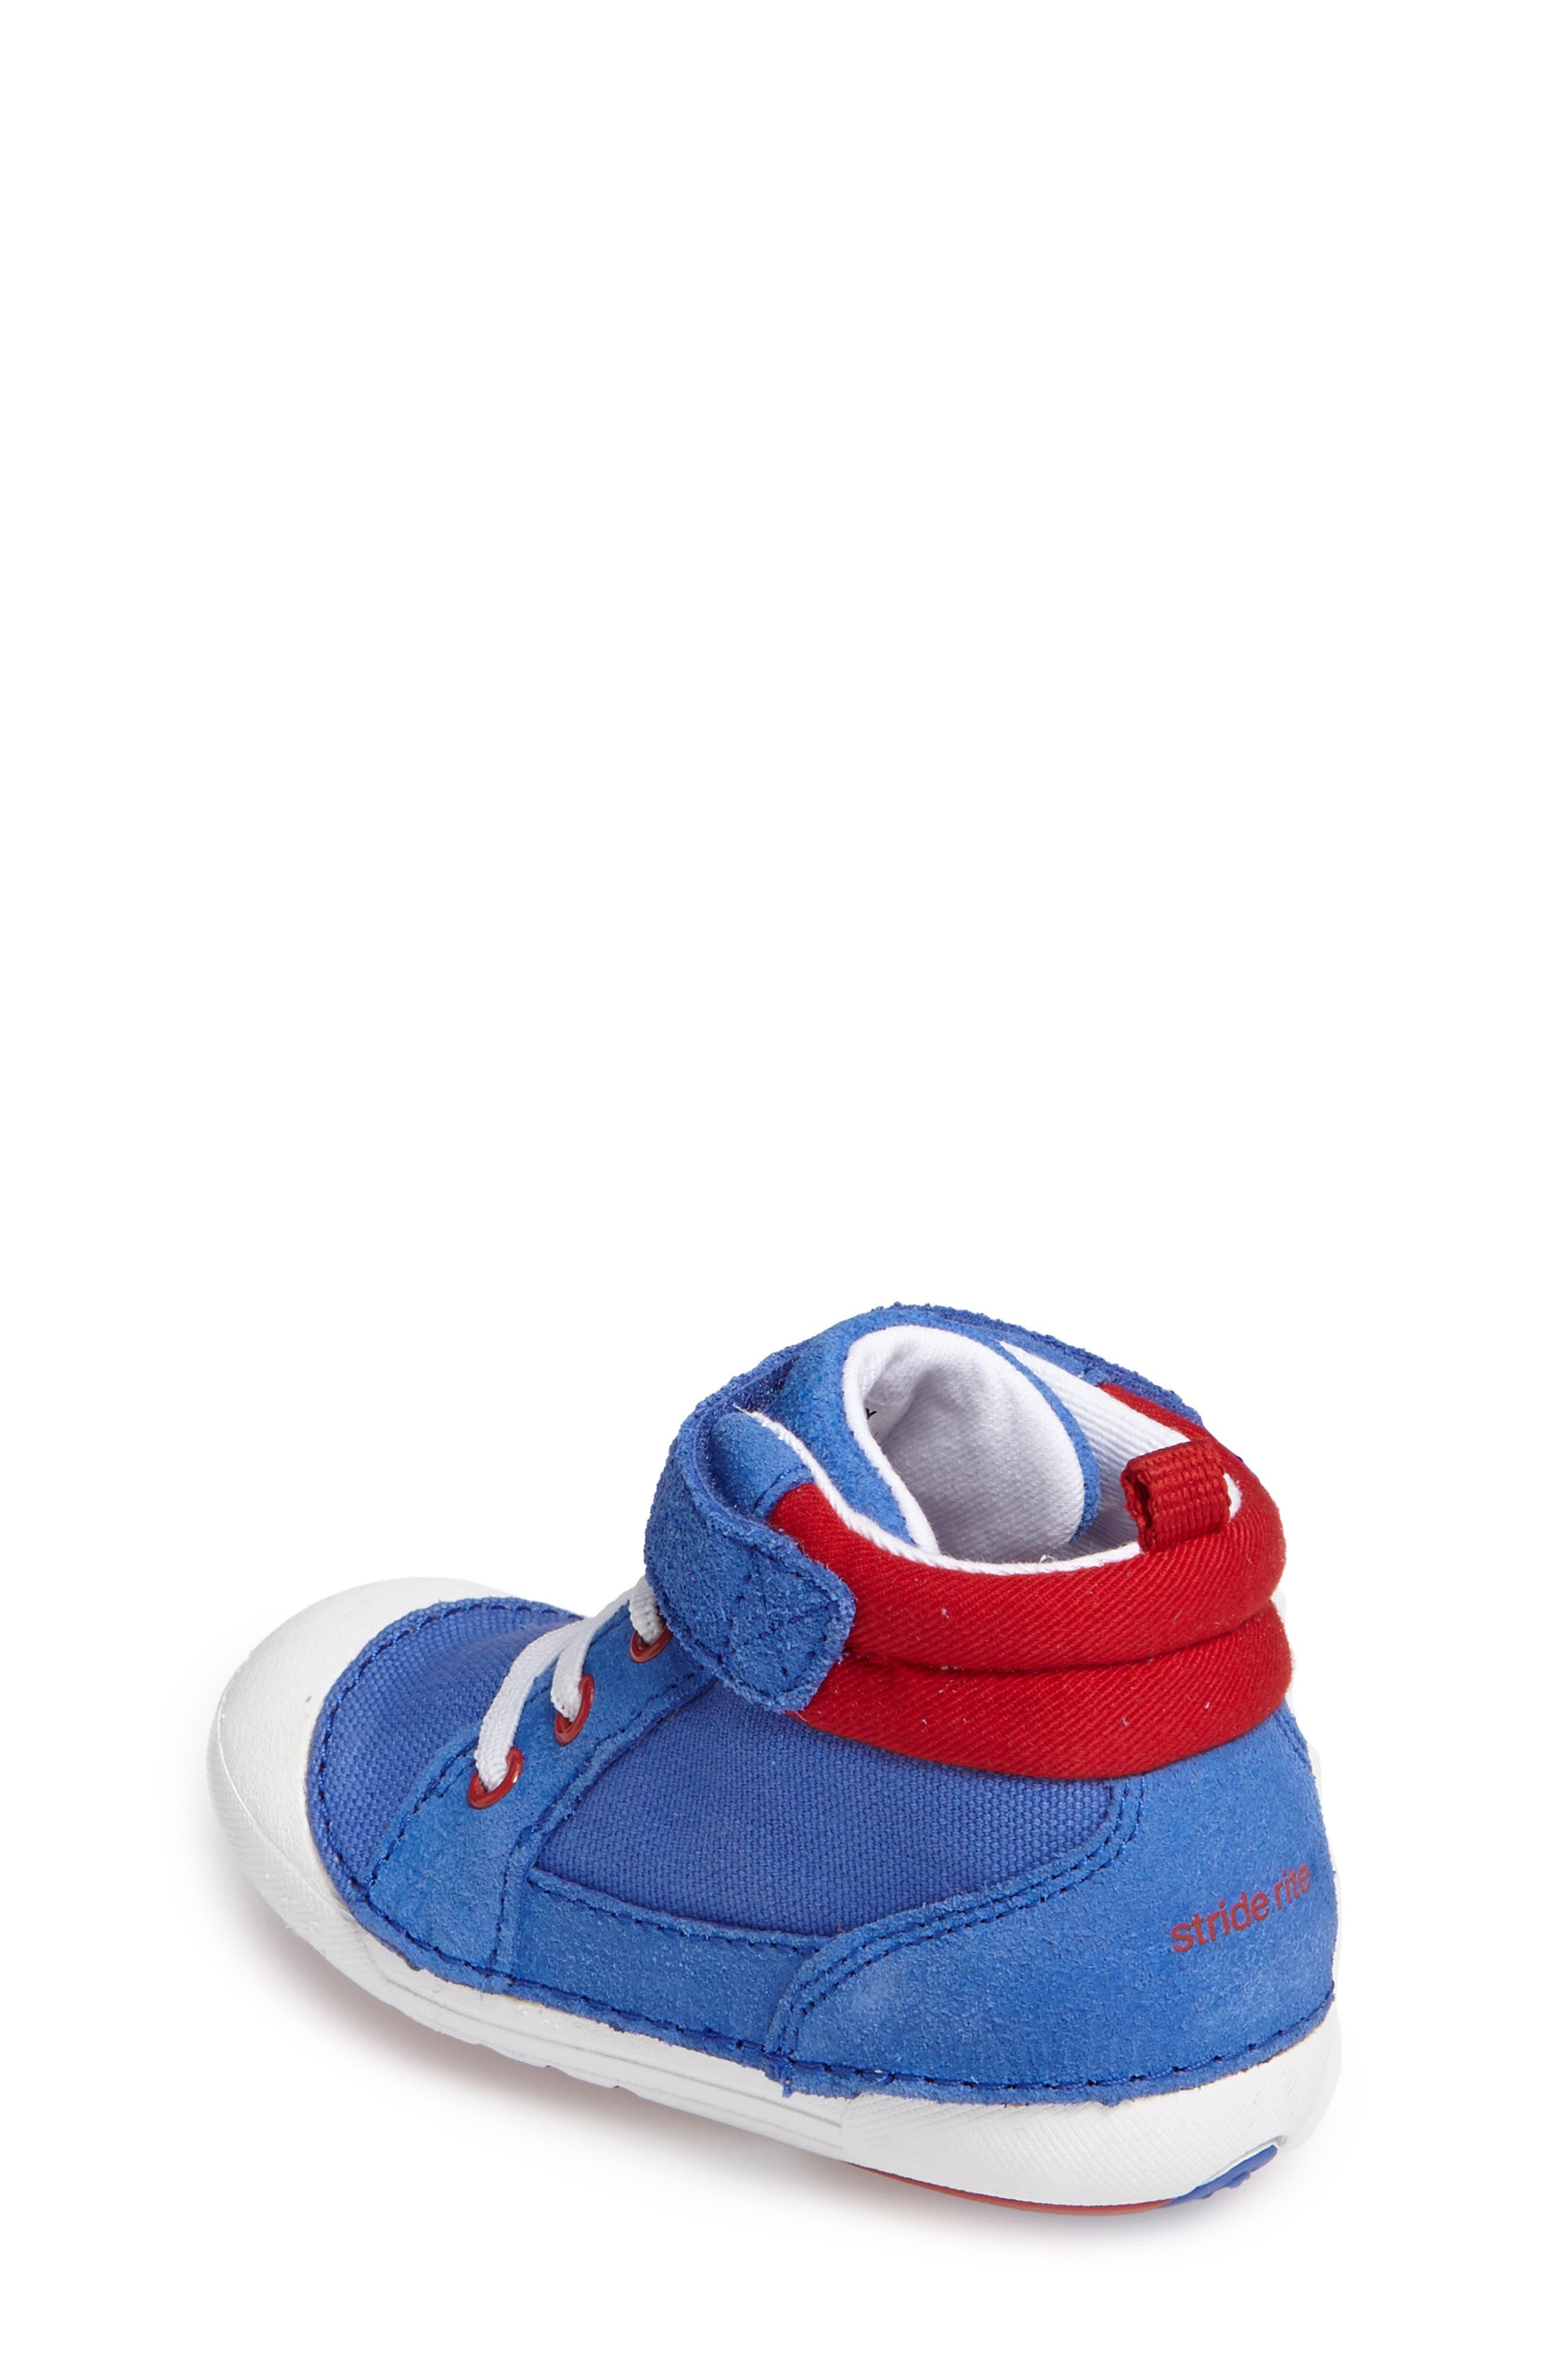 Soft Motion Danny Sneaker,                             Alternate thumbnail 12, color,